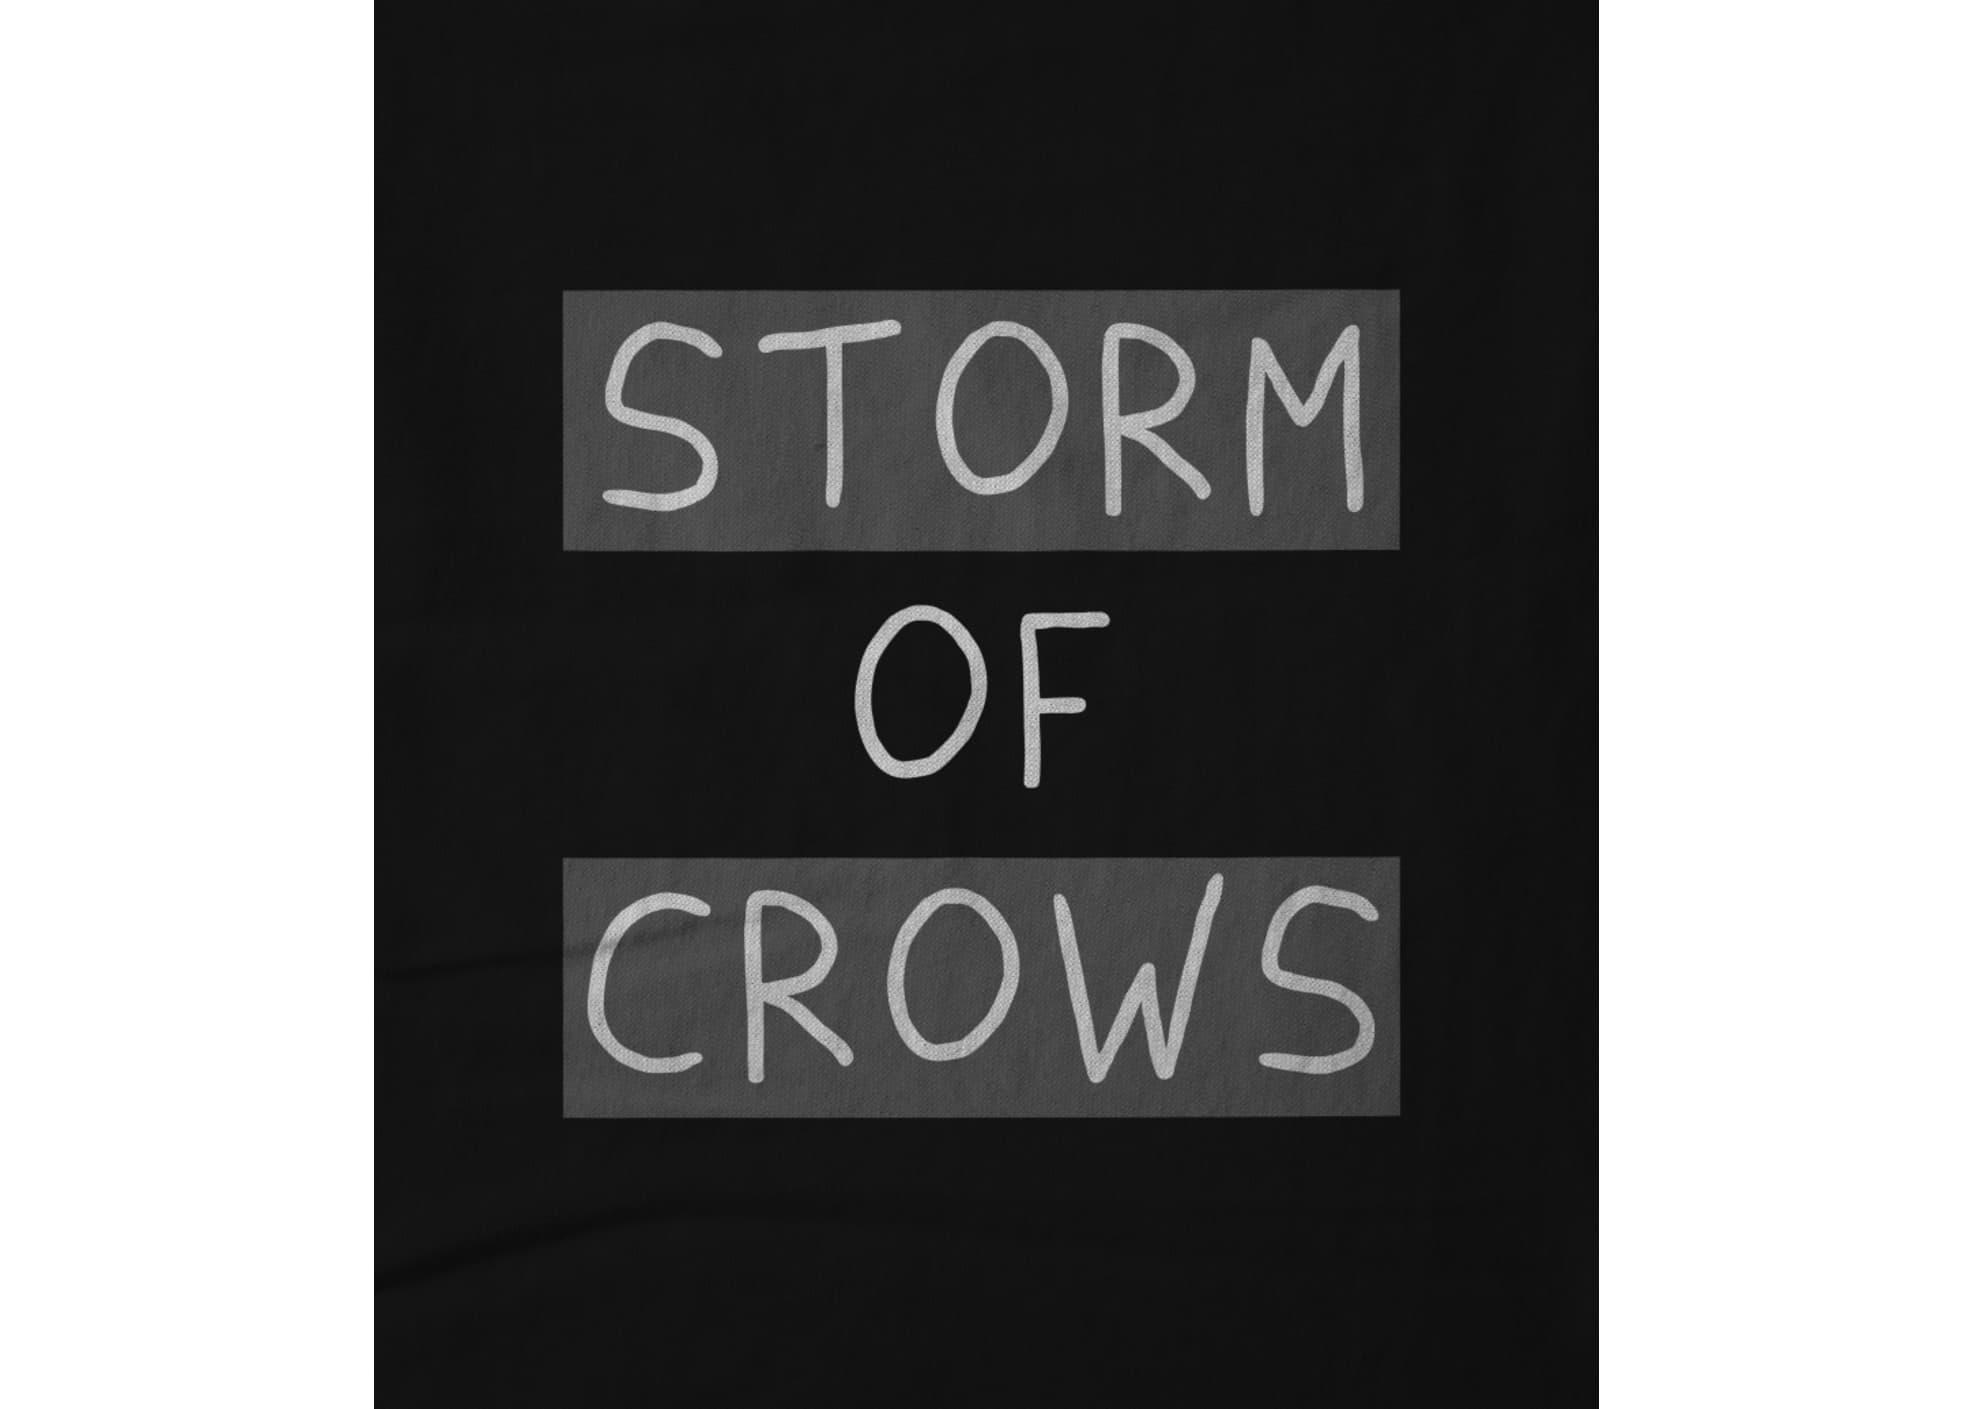 Storm of crows logo   black 1612199822